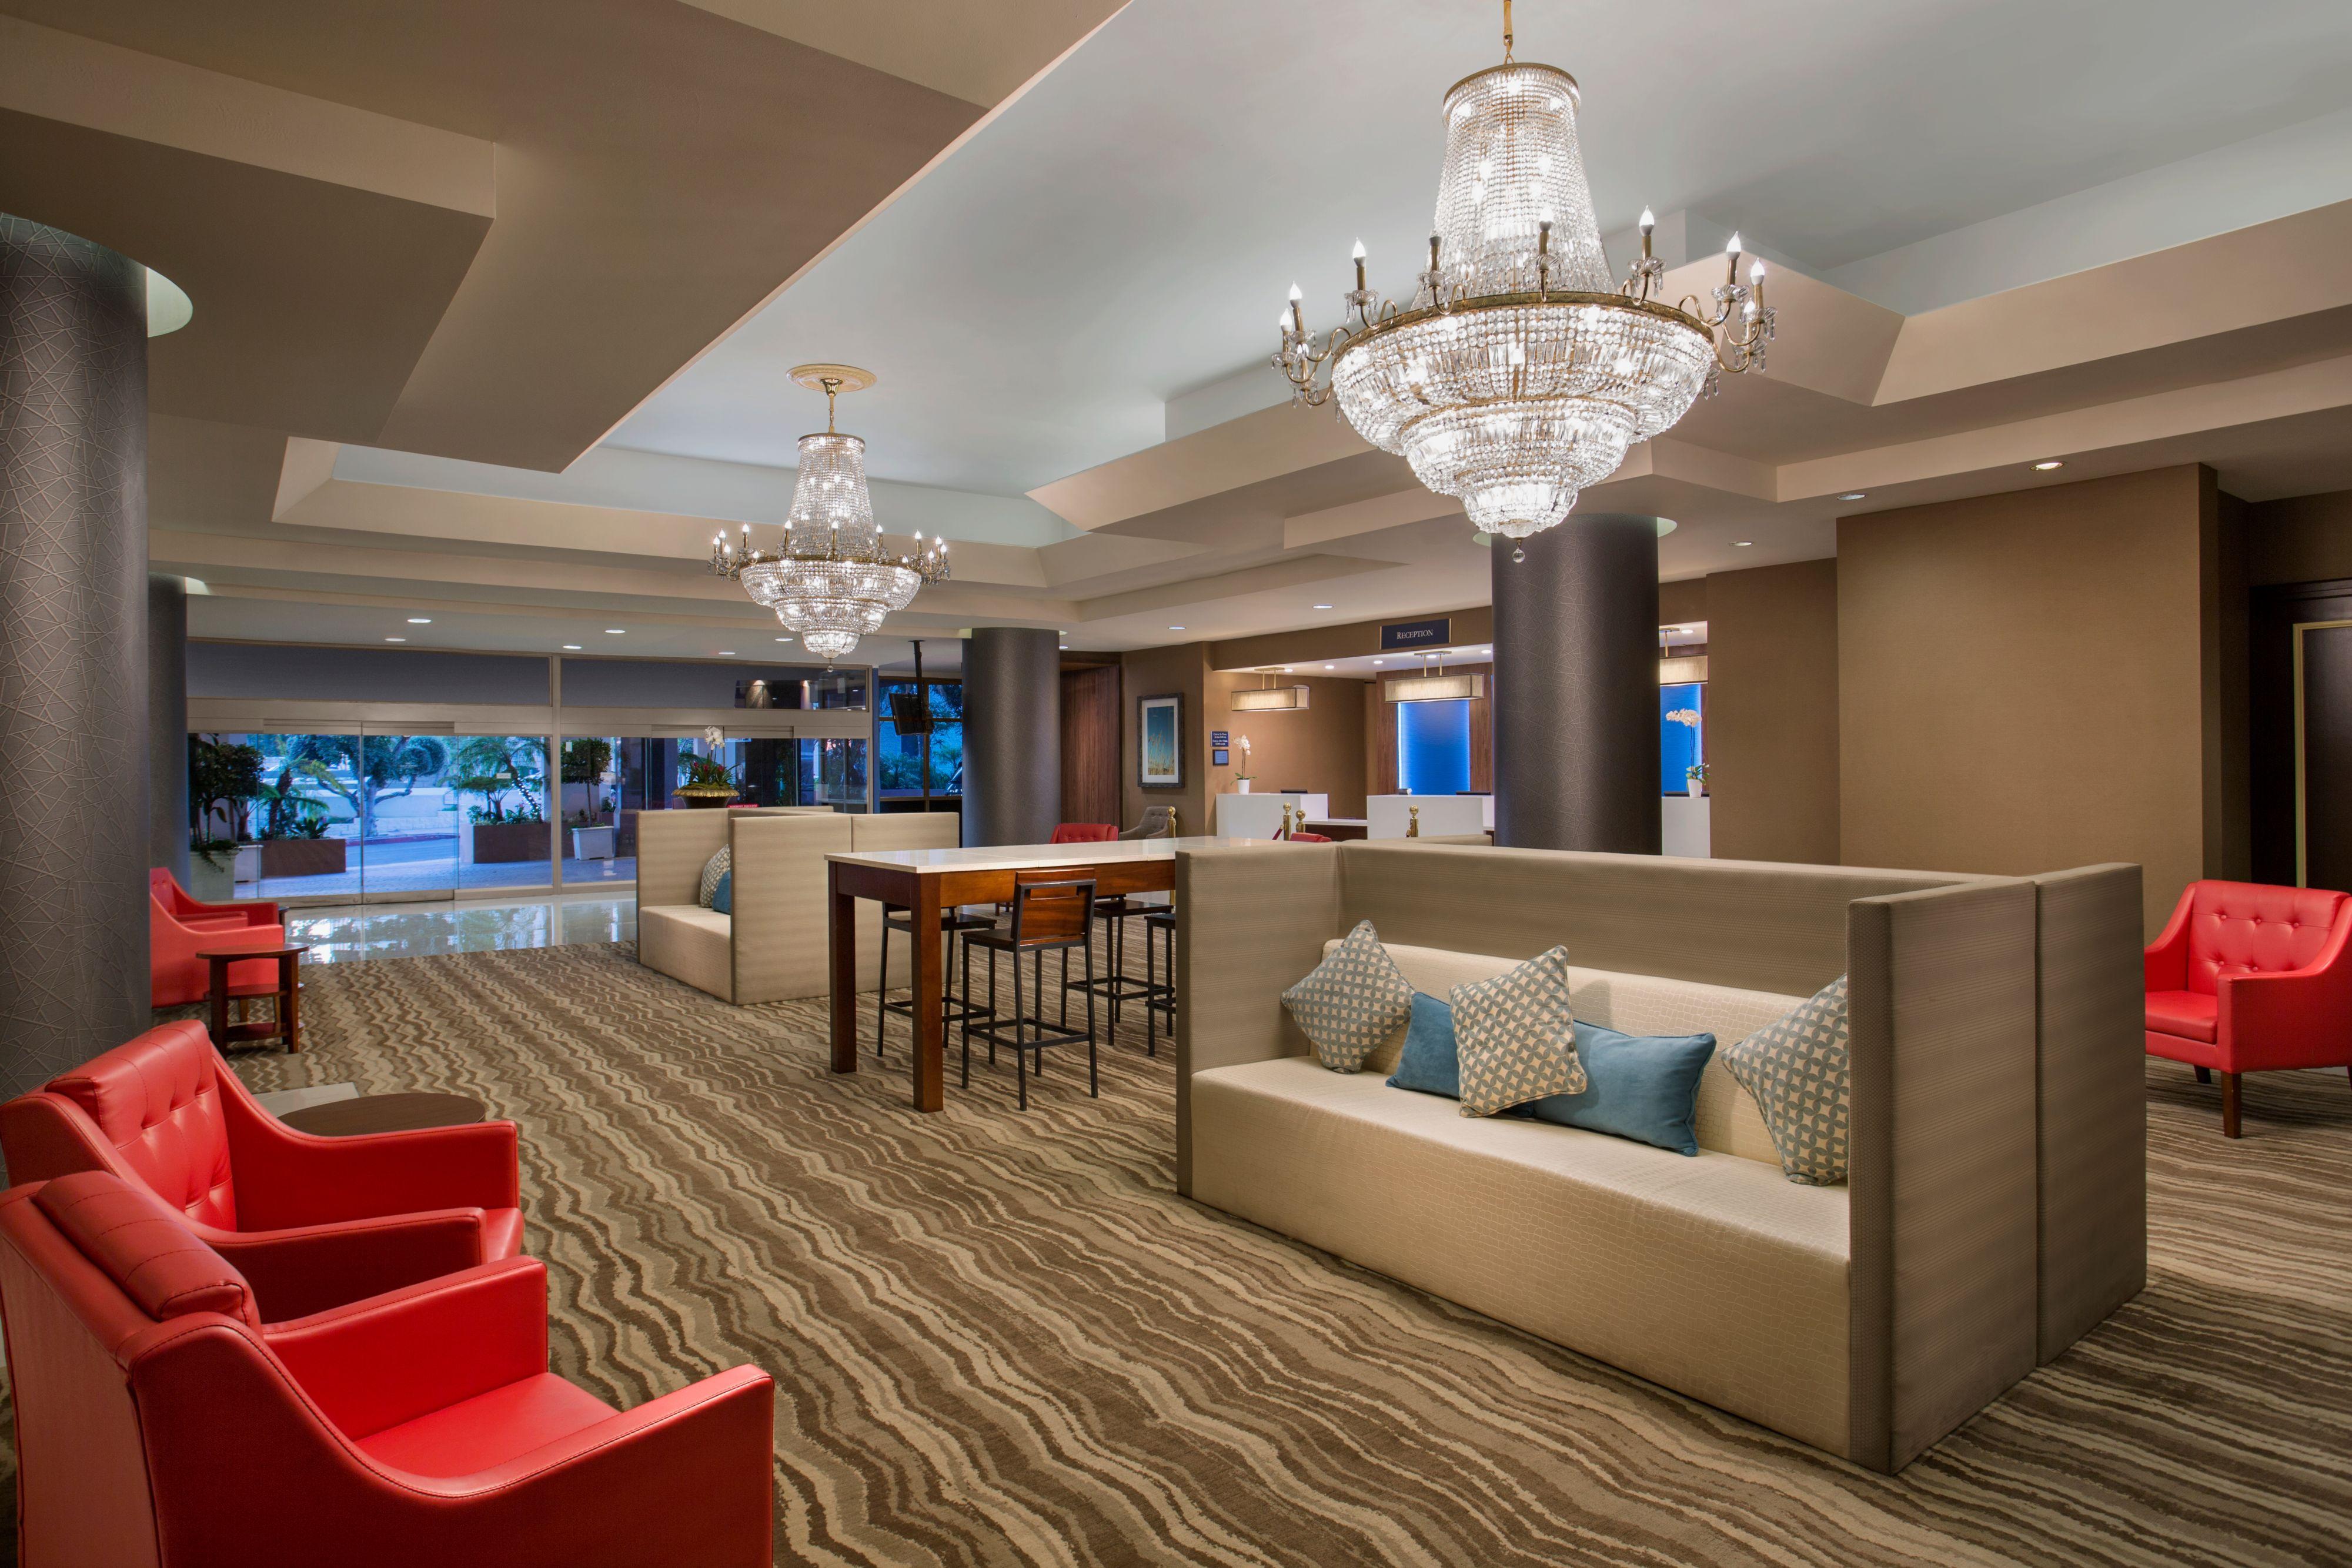 crowne plaza los angeles harbor hotel san pedro. Black Bedroom Furniture Sets. Home Design Ideas